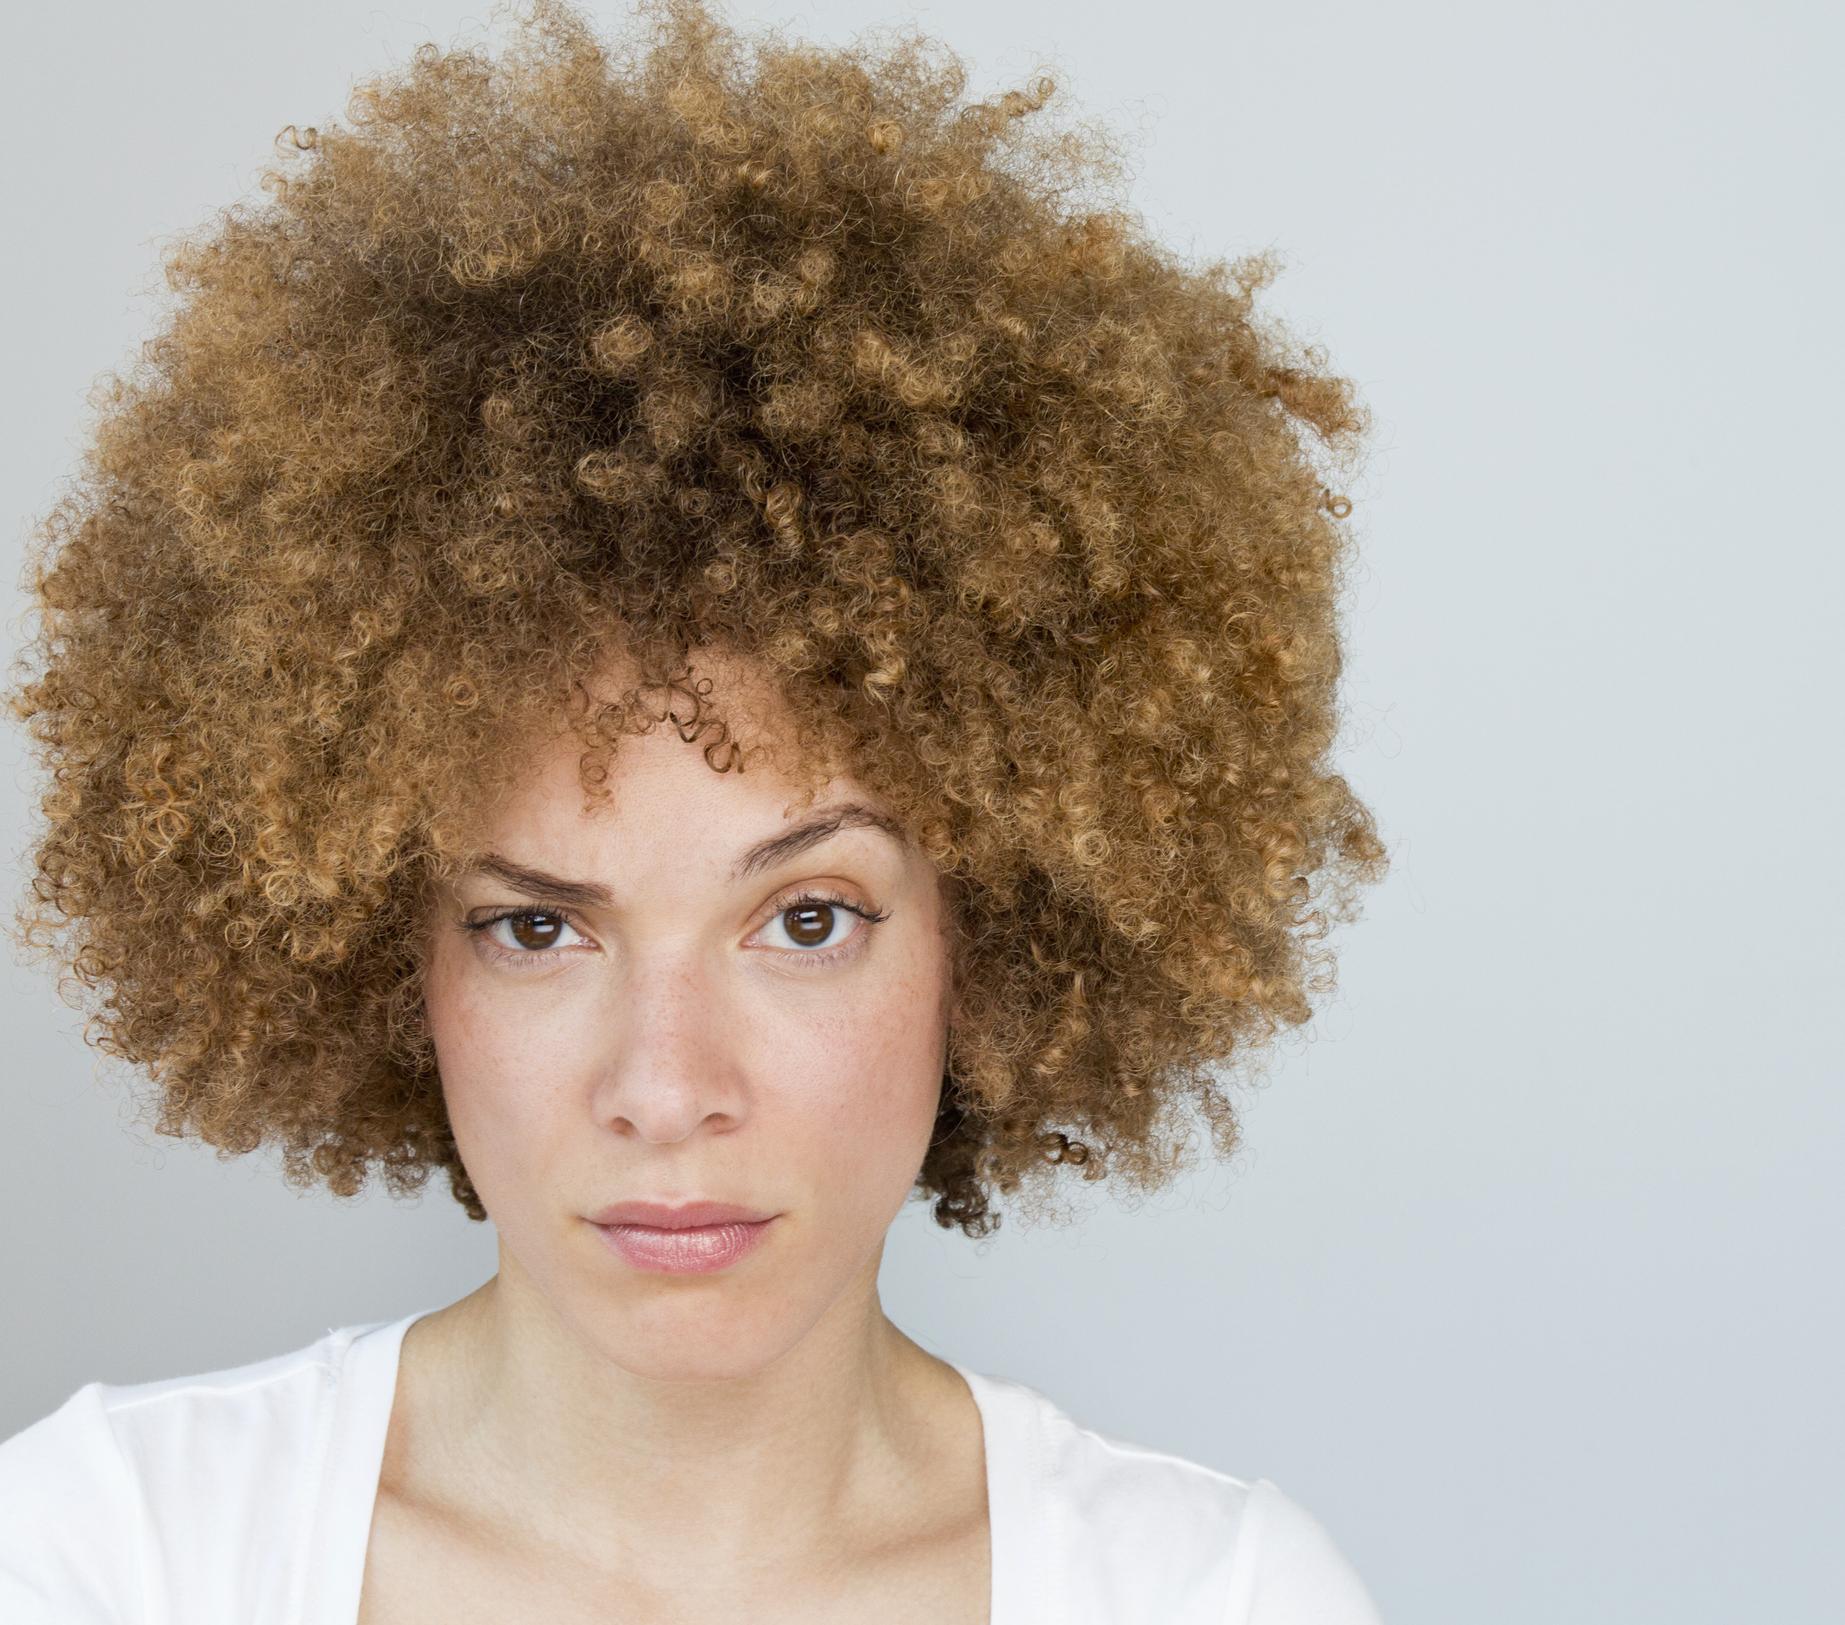 Black woman raising her eyebrow